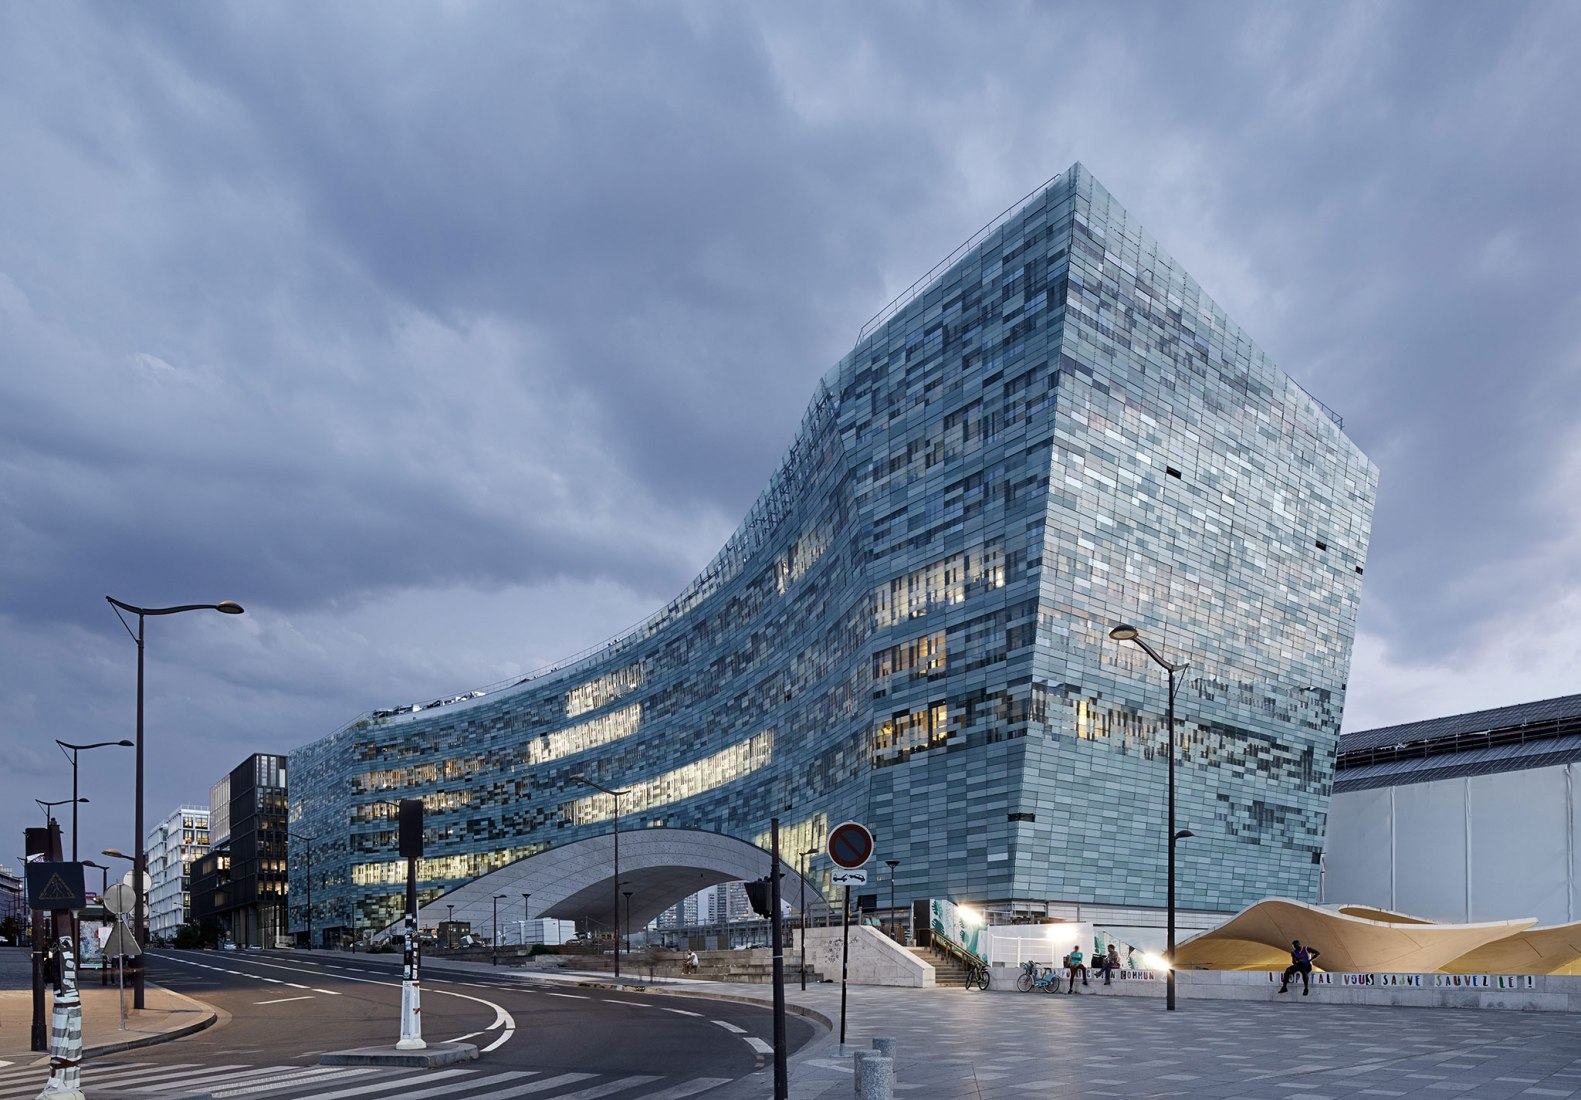 Le Monde Group headquarters por Snøhetta. Fotografía por Marwan Harmouche